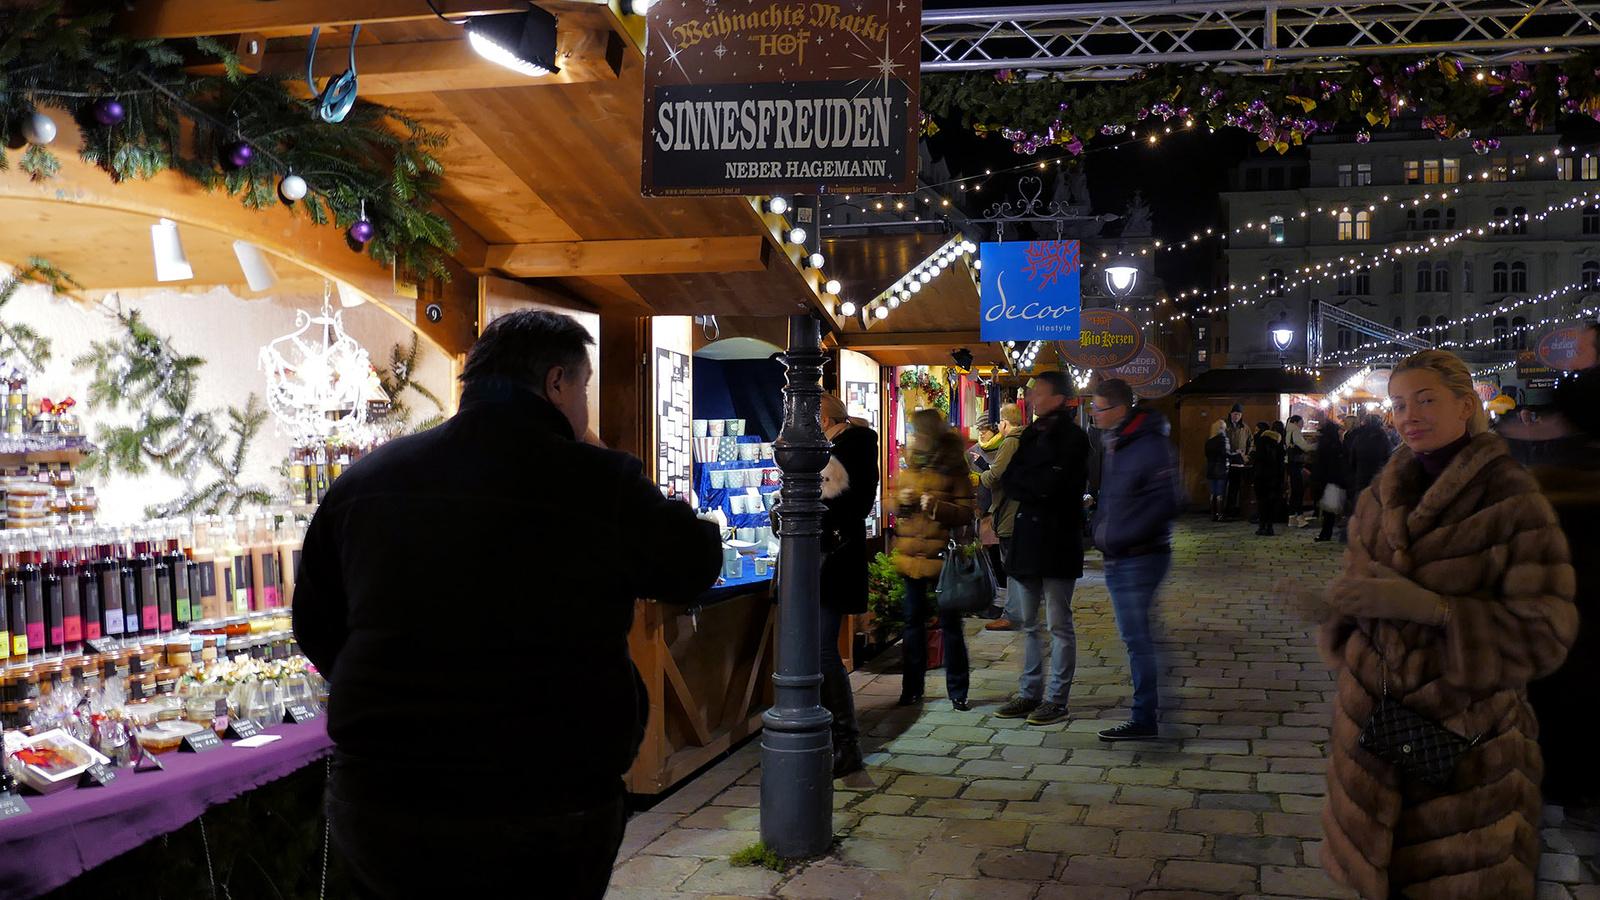 Bécs - weihnachten Markt Am Hoh. Sinnesfreuden